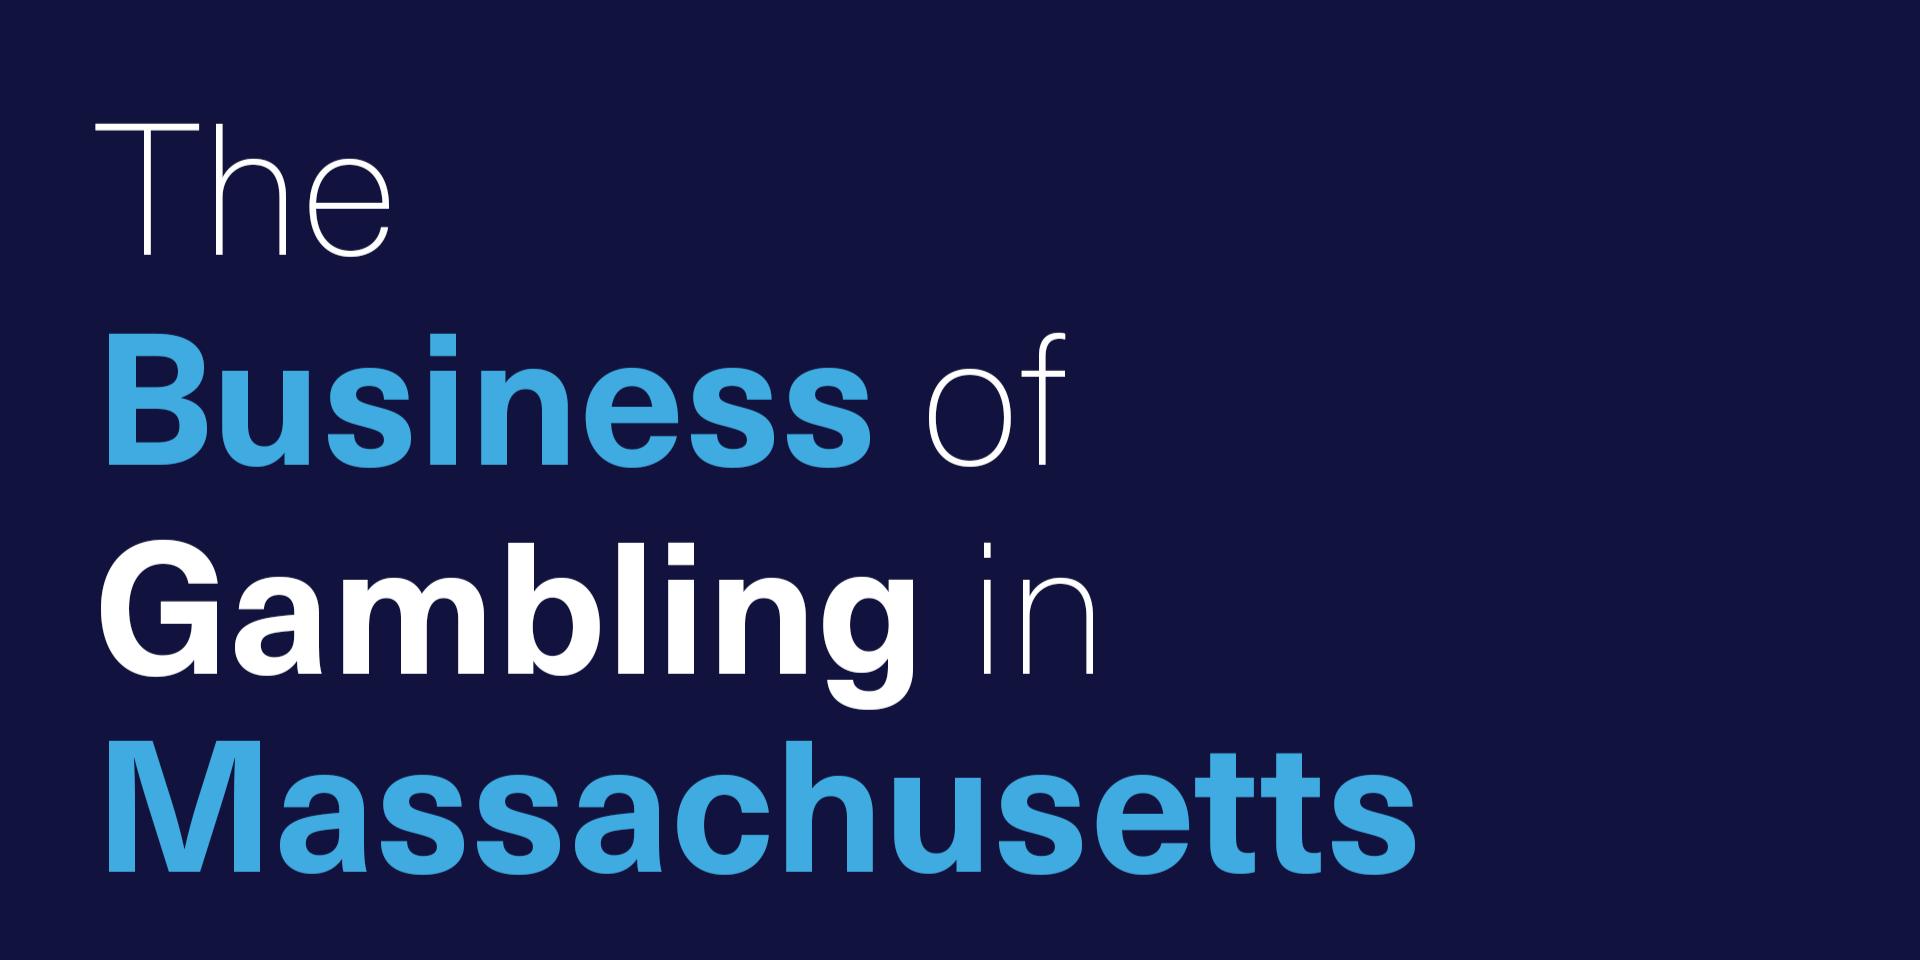 The Business of Gambling in Massachusetts